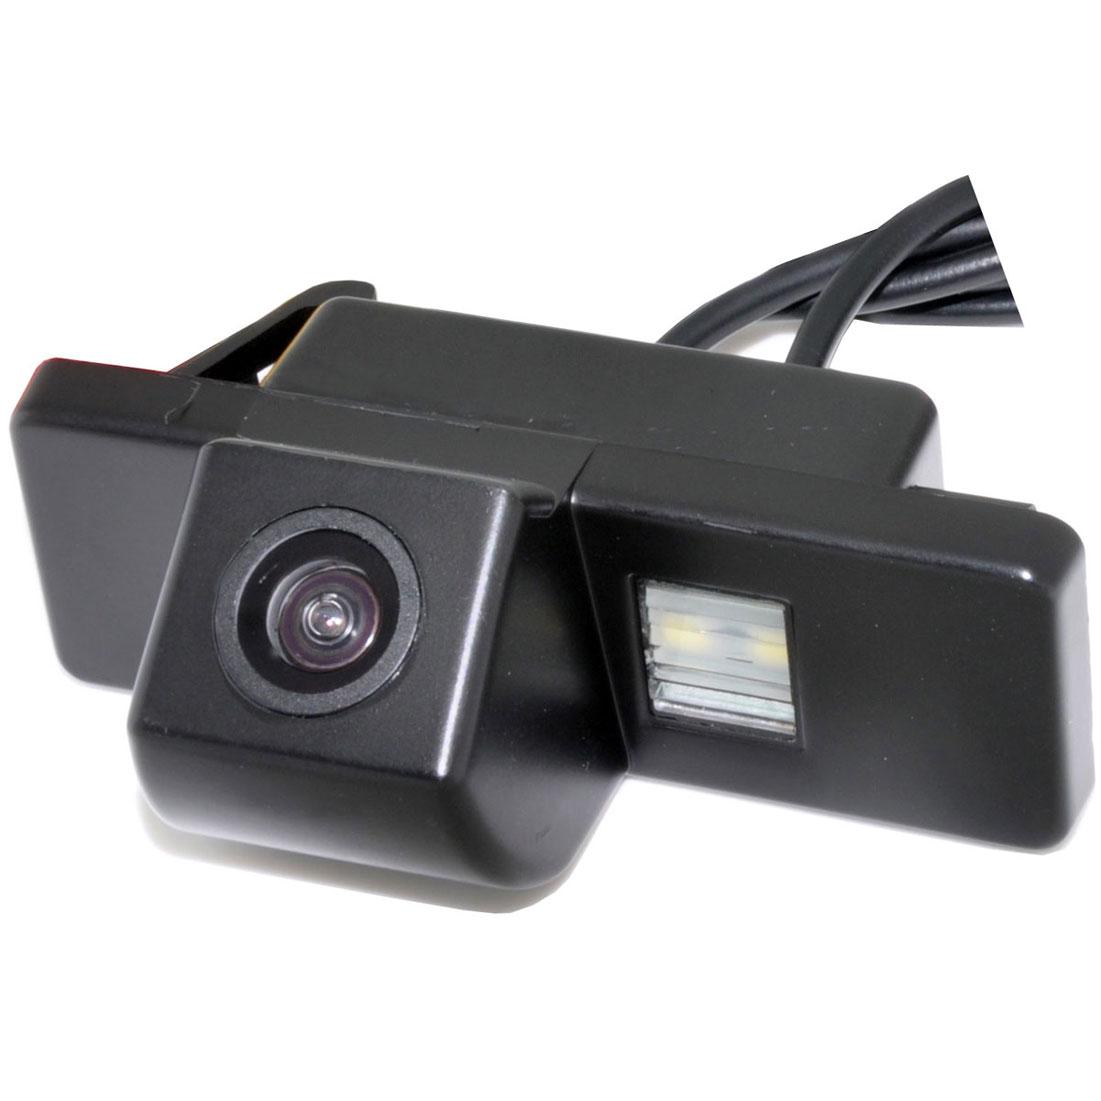 HD CCD Car Rear View Reverse Camera For Nissan QASHQAI X-TRAIL Geniss Citroen C4 C5 C-Triomphe Peugeot 307CC Pathfinder Dualis